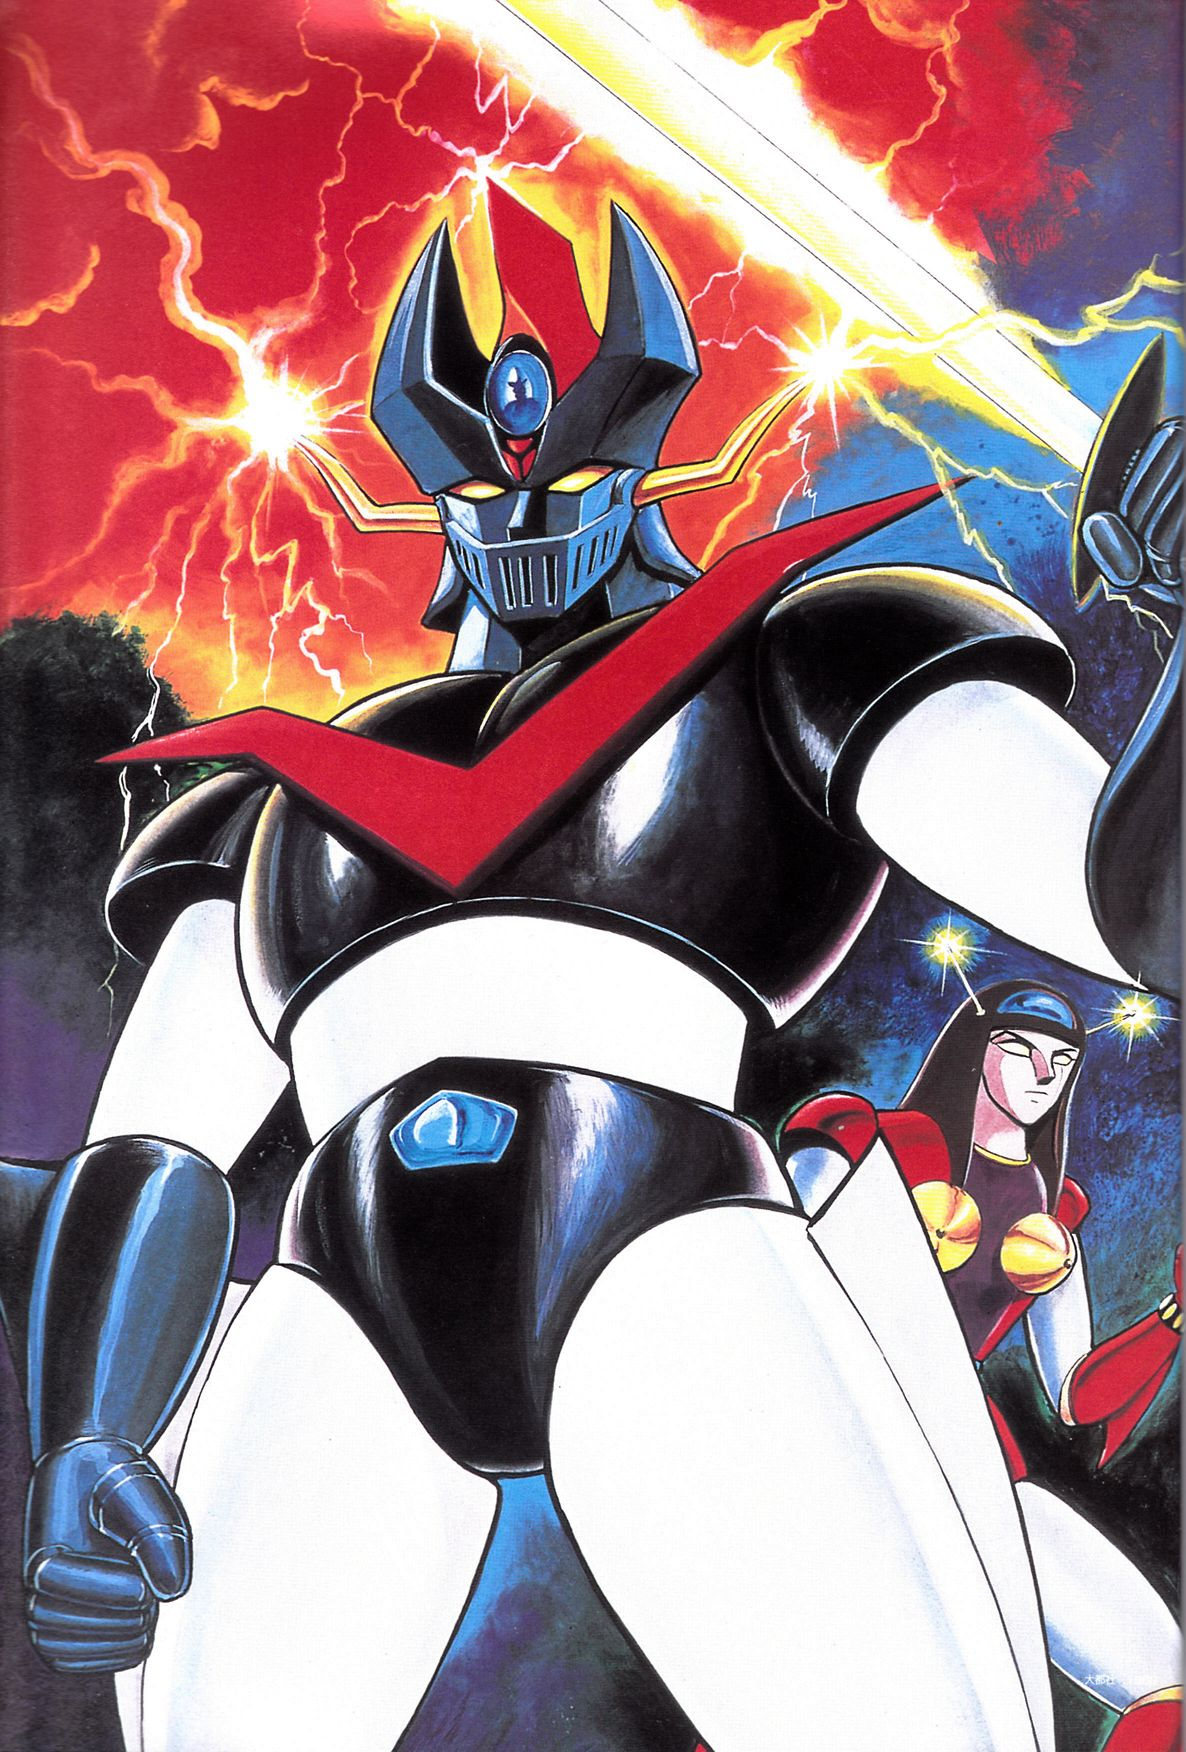 Great mazinger by go nagai robots cartoni animati fumetti manga